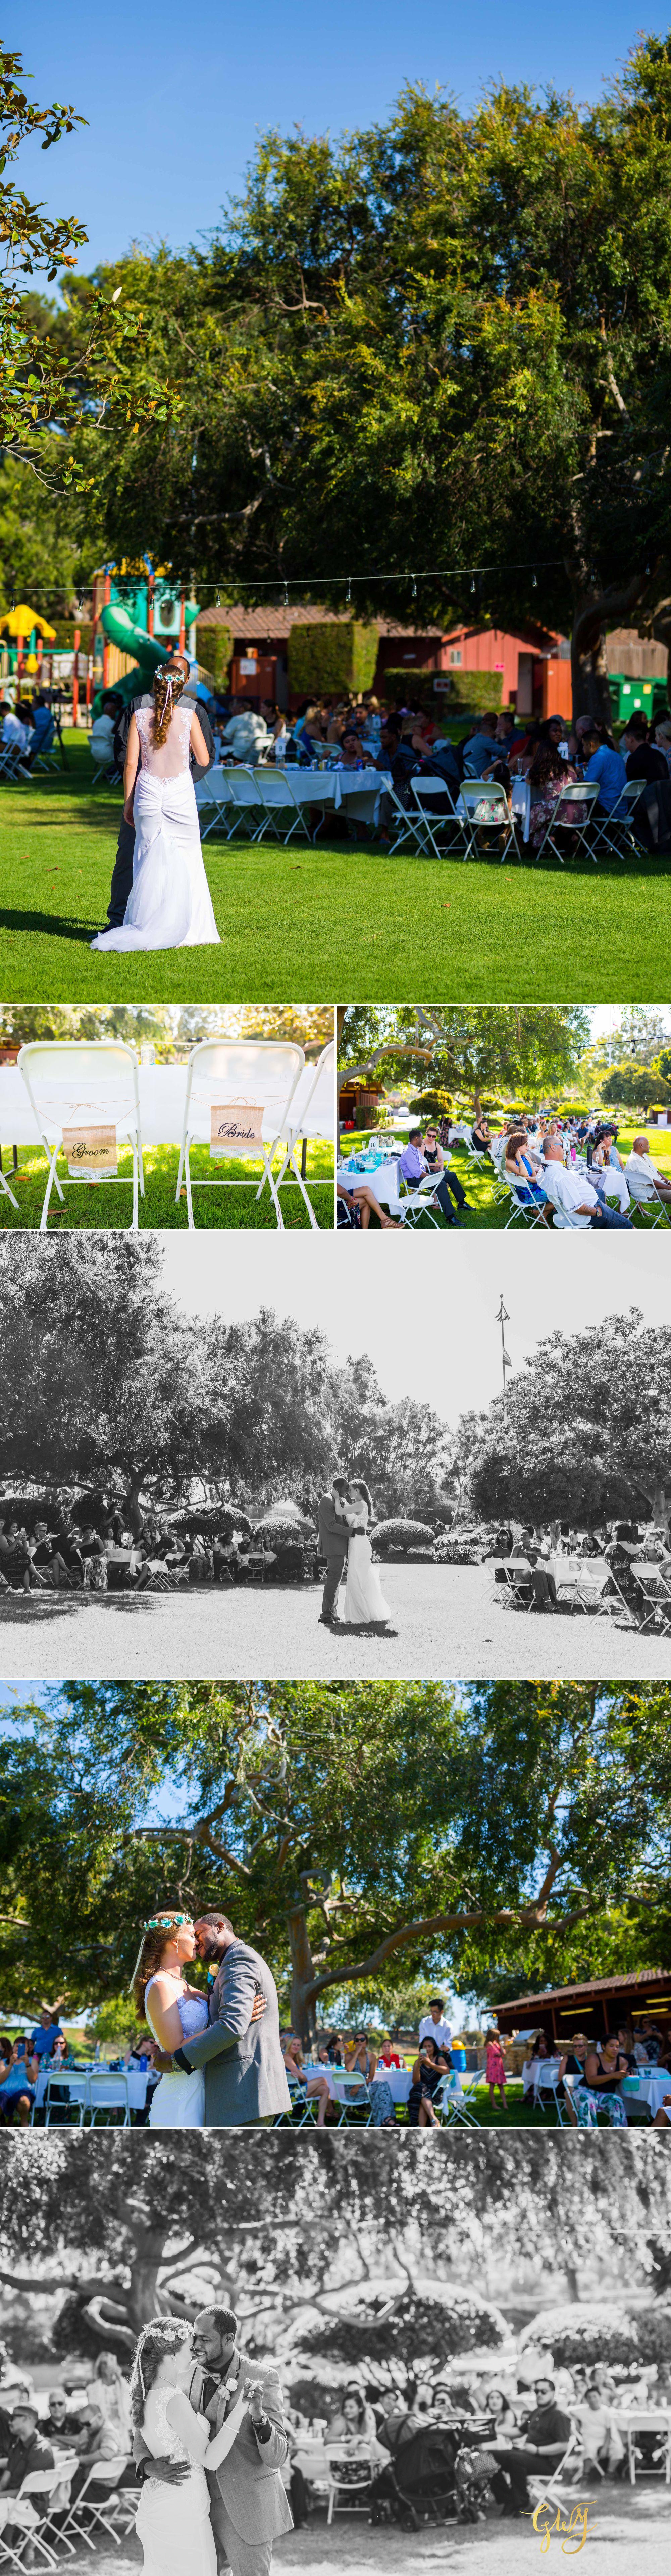 Rebecca + Torand El Segundo Chevron Employee Park Summer Barbados Bajan Wedding by Glass Woods Media 10.jpg